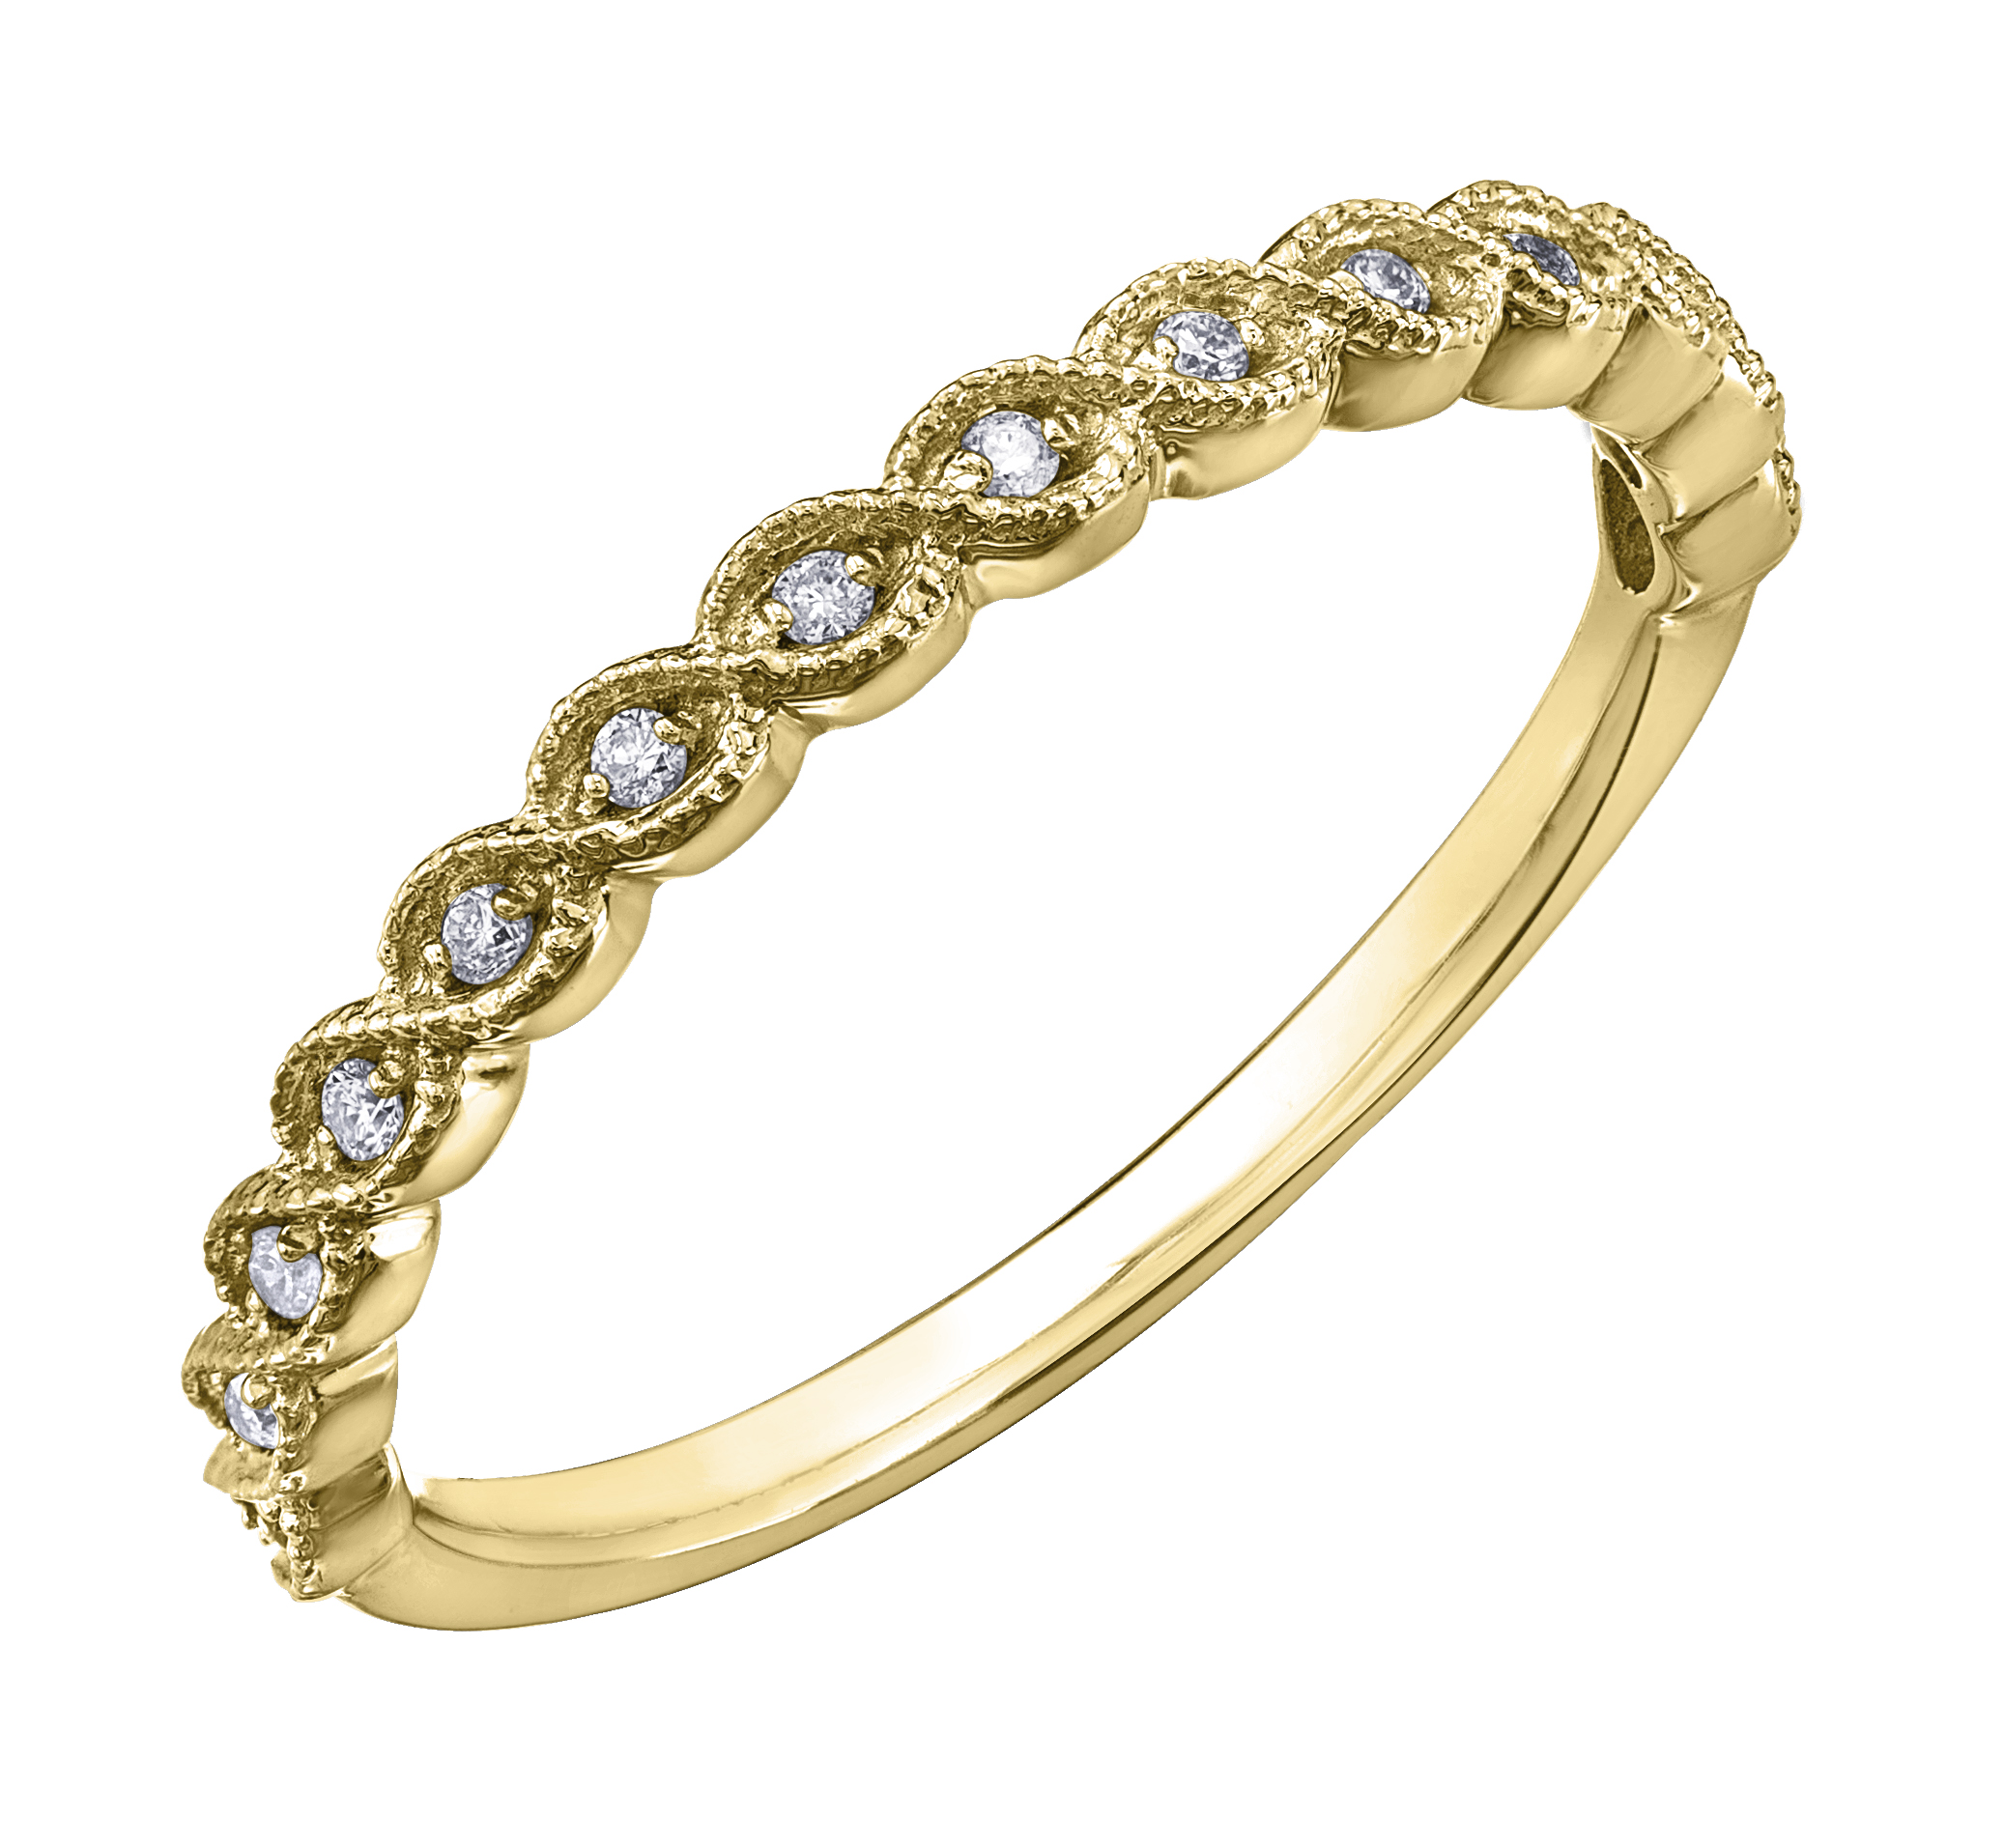 Jonc d'anniversaire - Or jaune10K & Diamants totalisant 0.07 carat